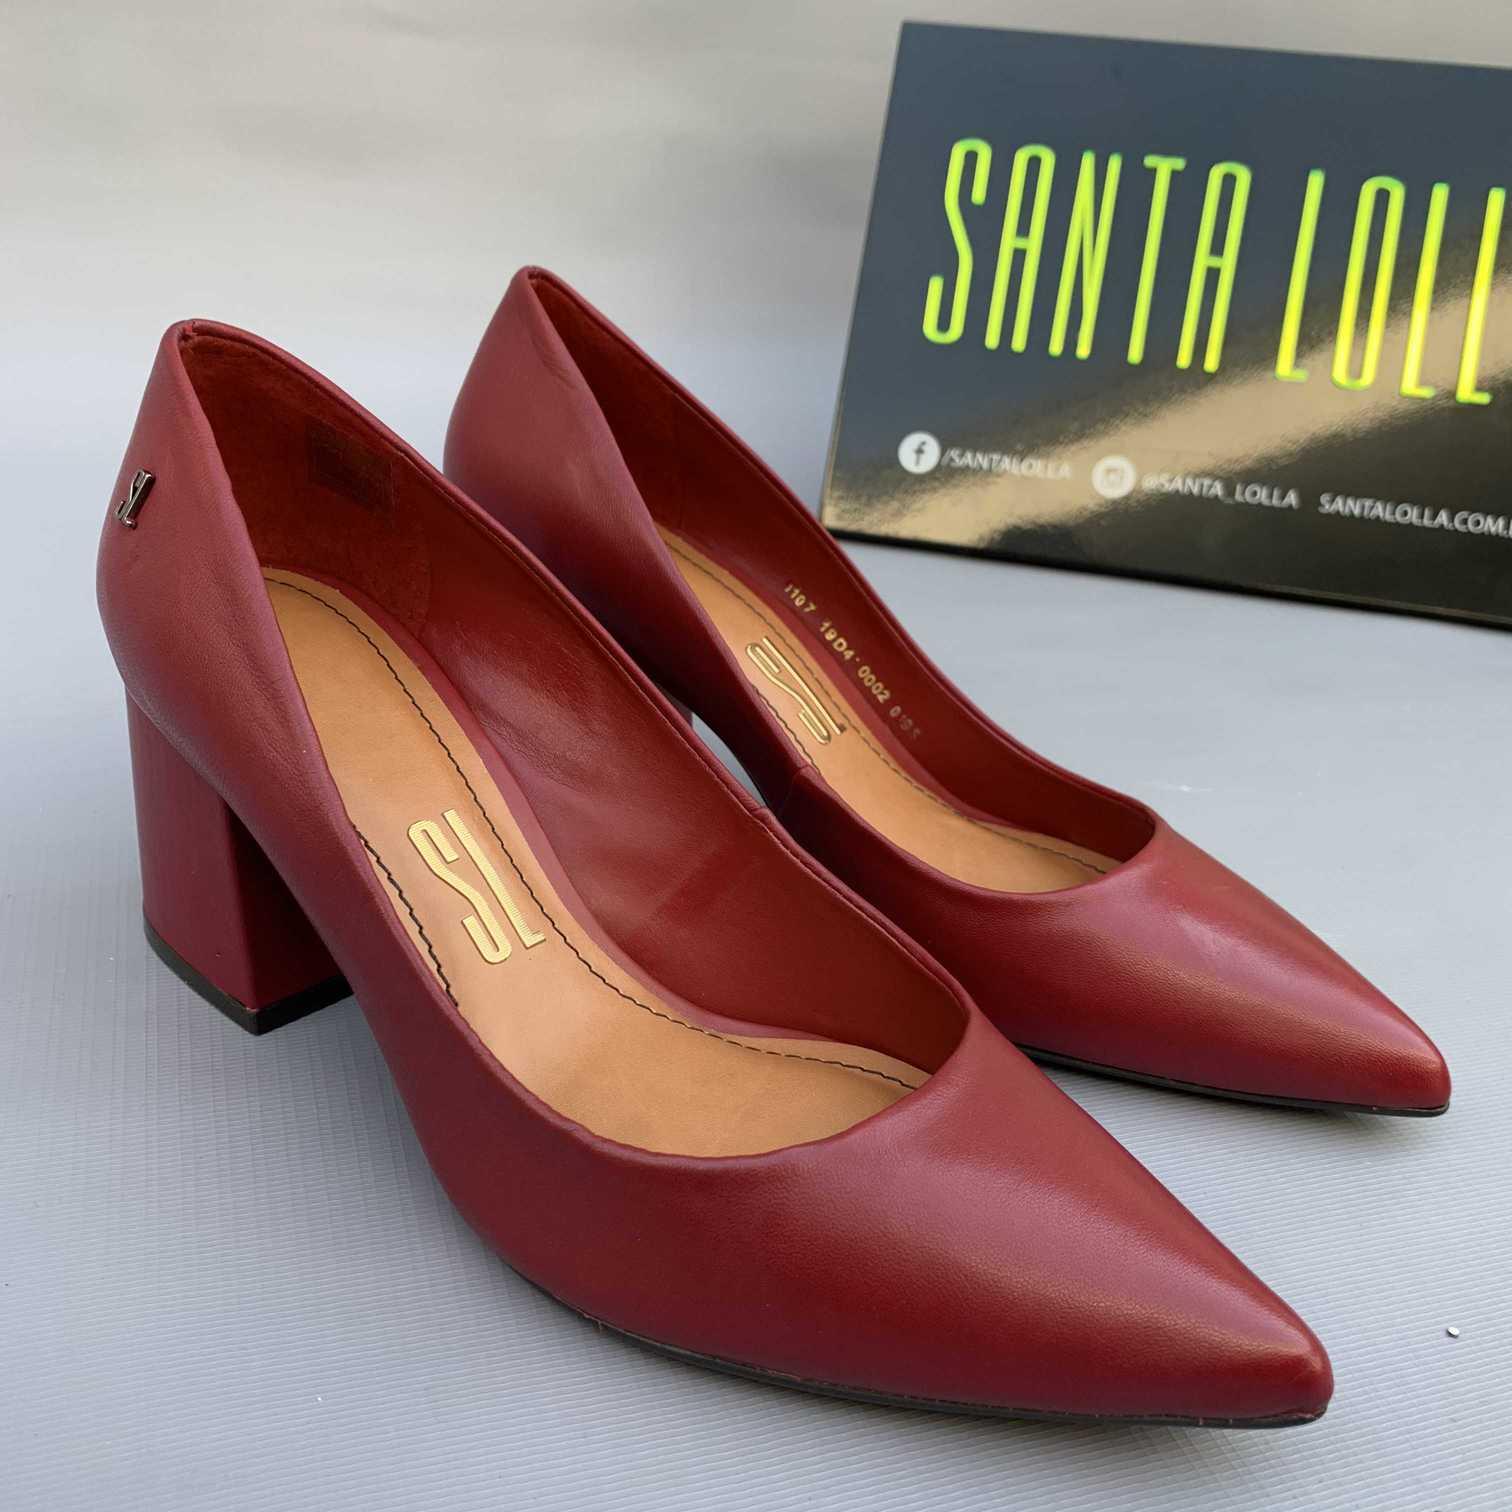 Sapato Clássico Santa Lolla  - Choque Concept